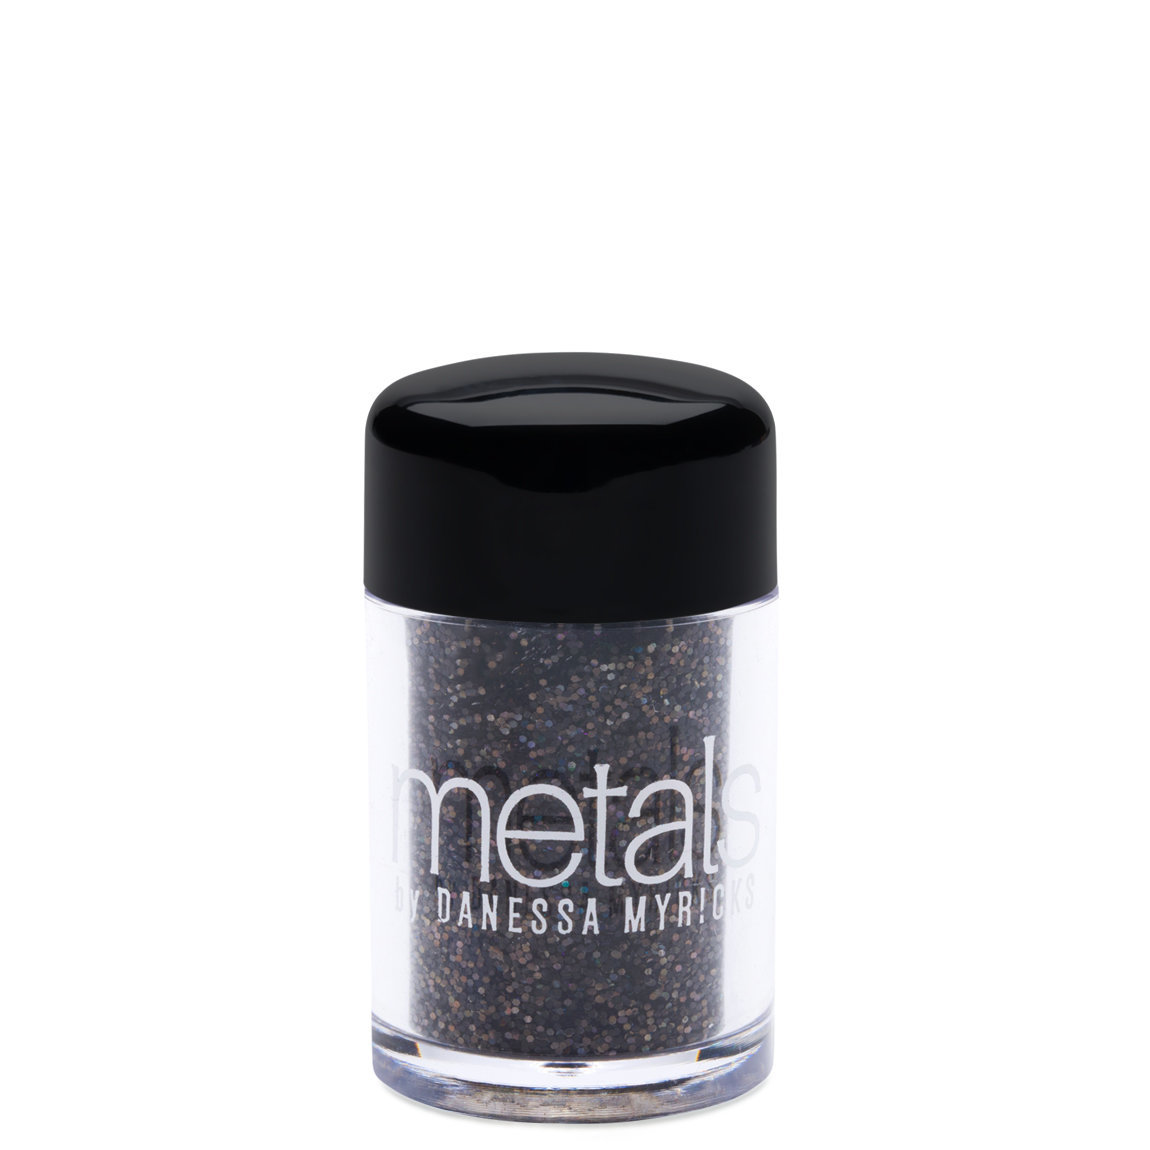 Danessa Myricks Beauty Metals Glitter Black Star alternative view 1.